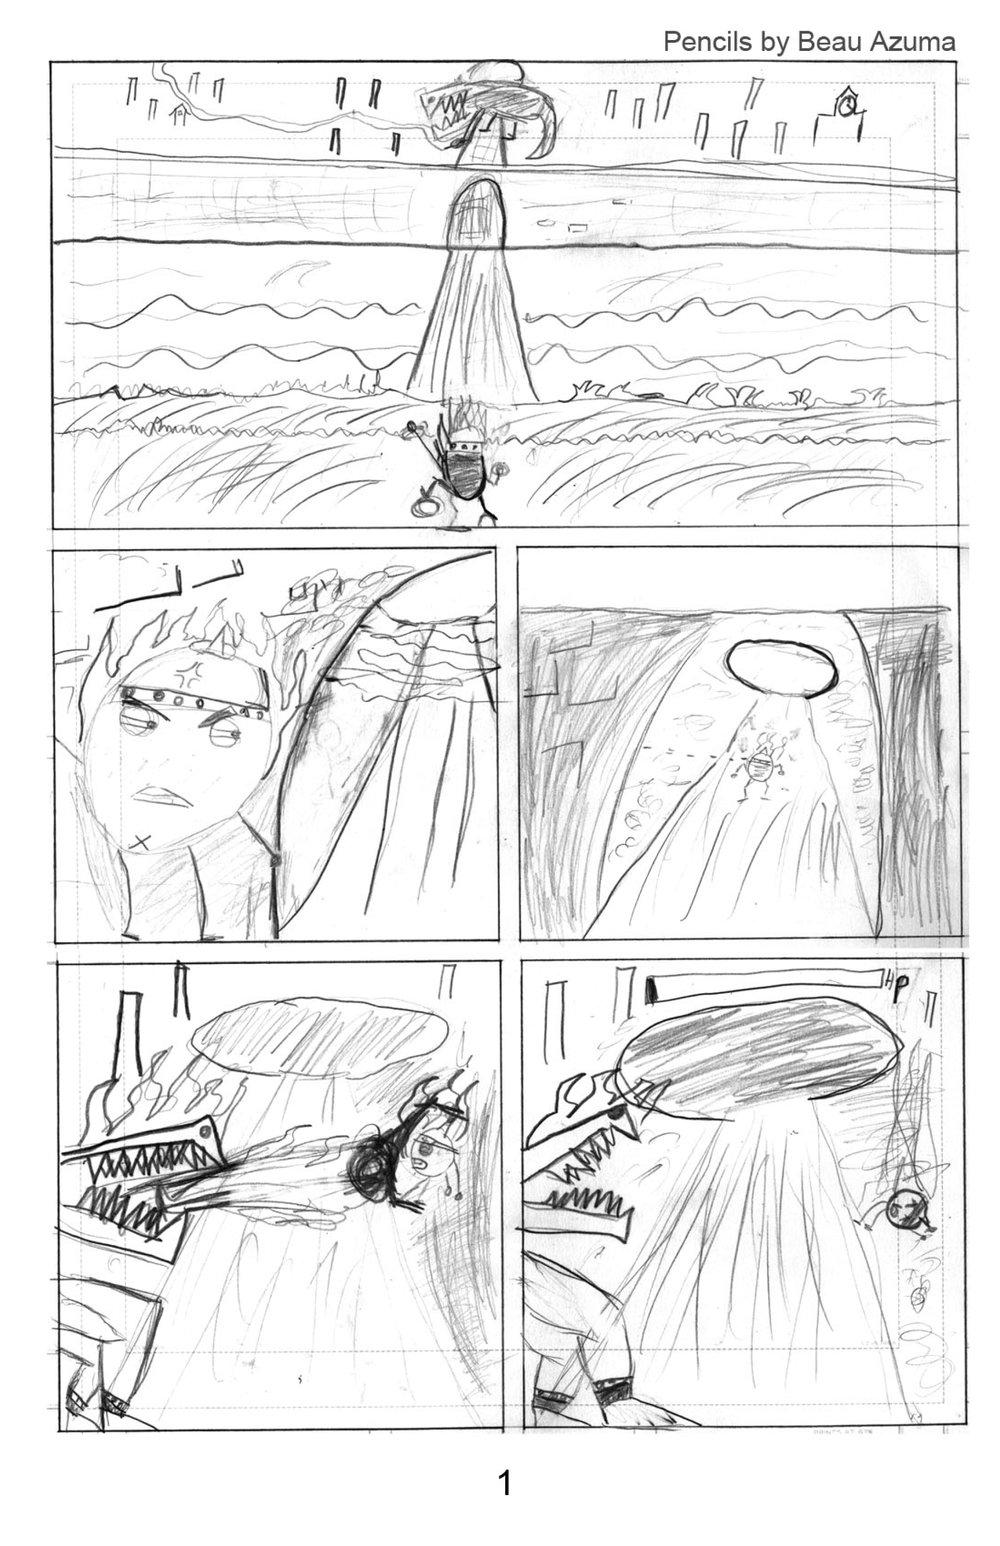 ev page 1.jpg